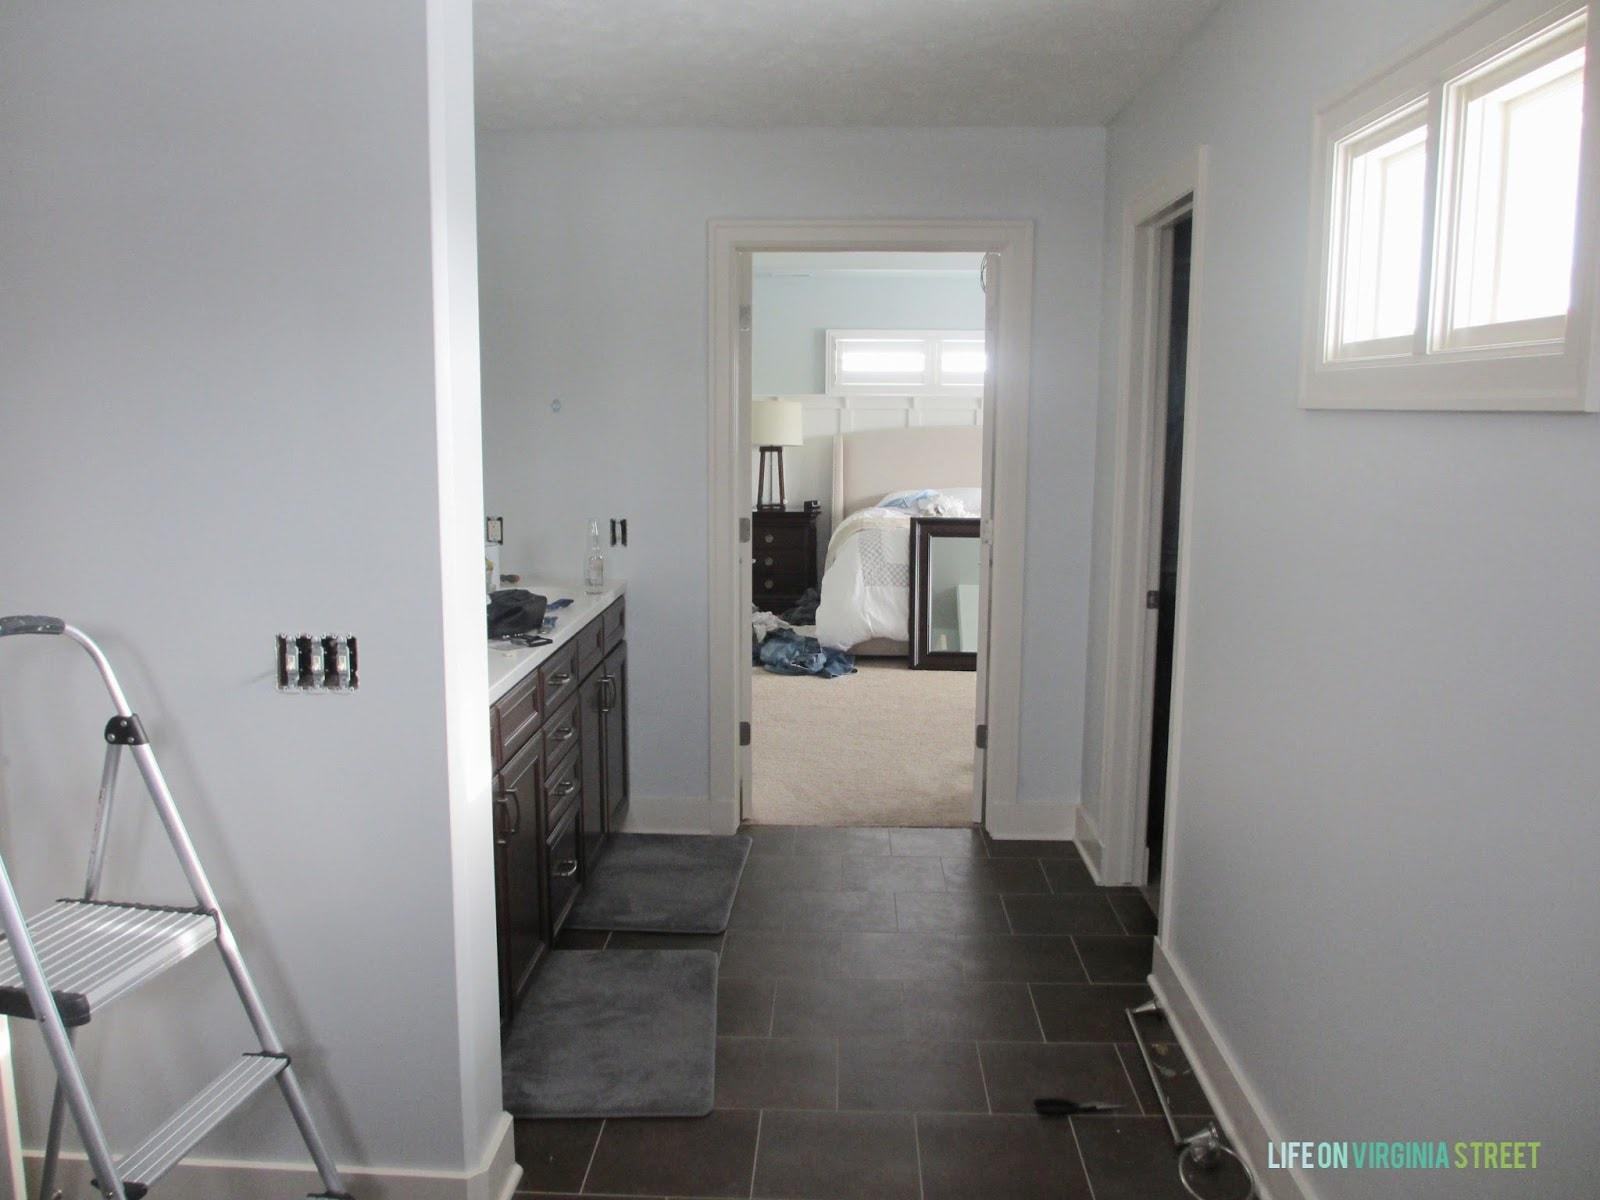 behr bathroom paintMaster Bath Refresh Now Under Construction  Life On Virginia Street